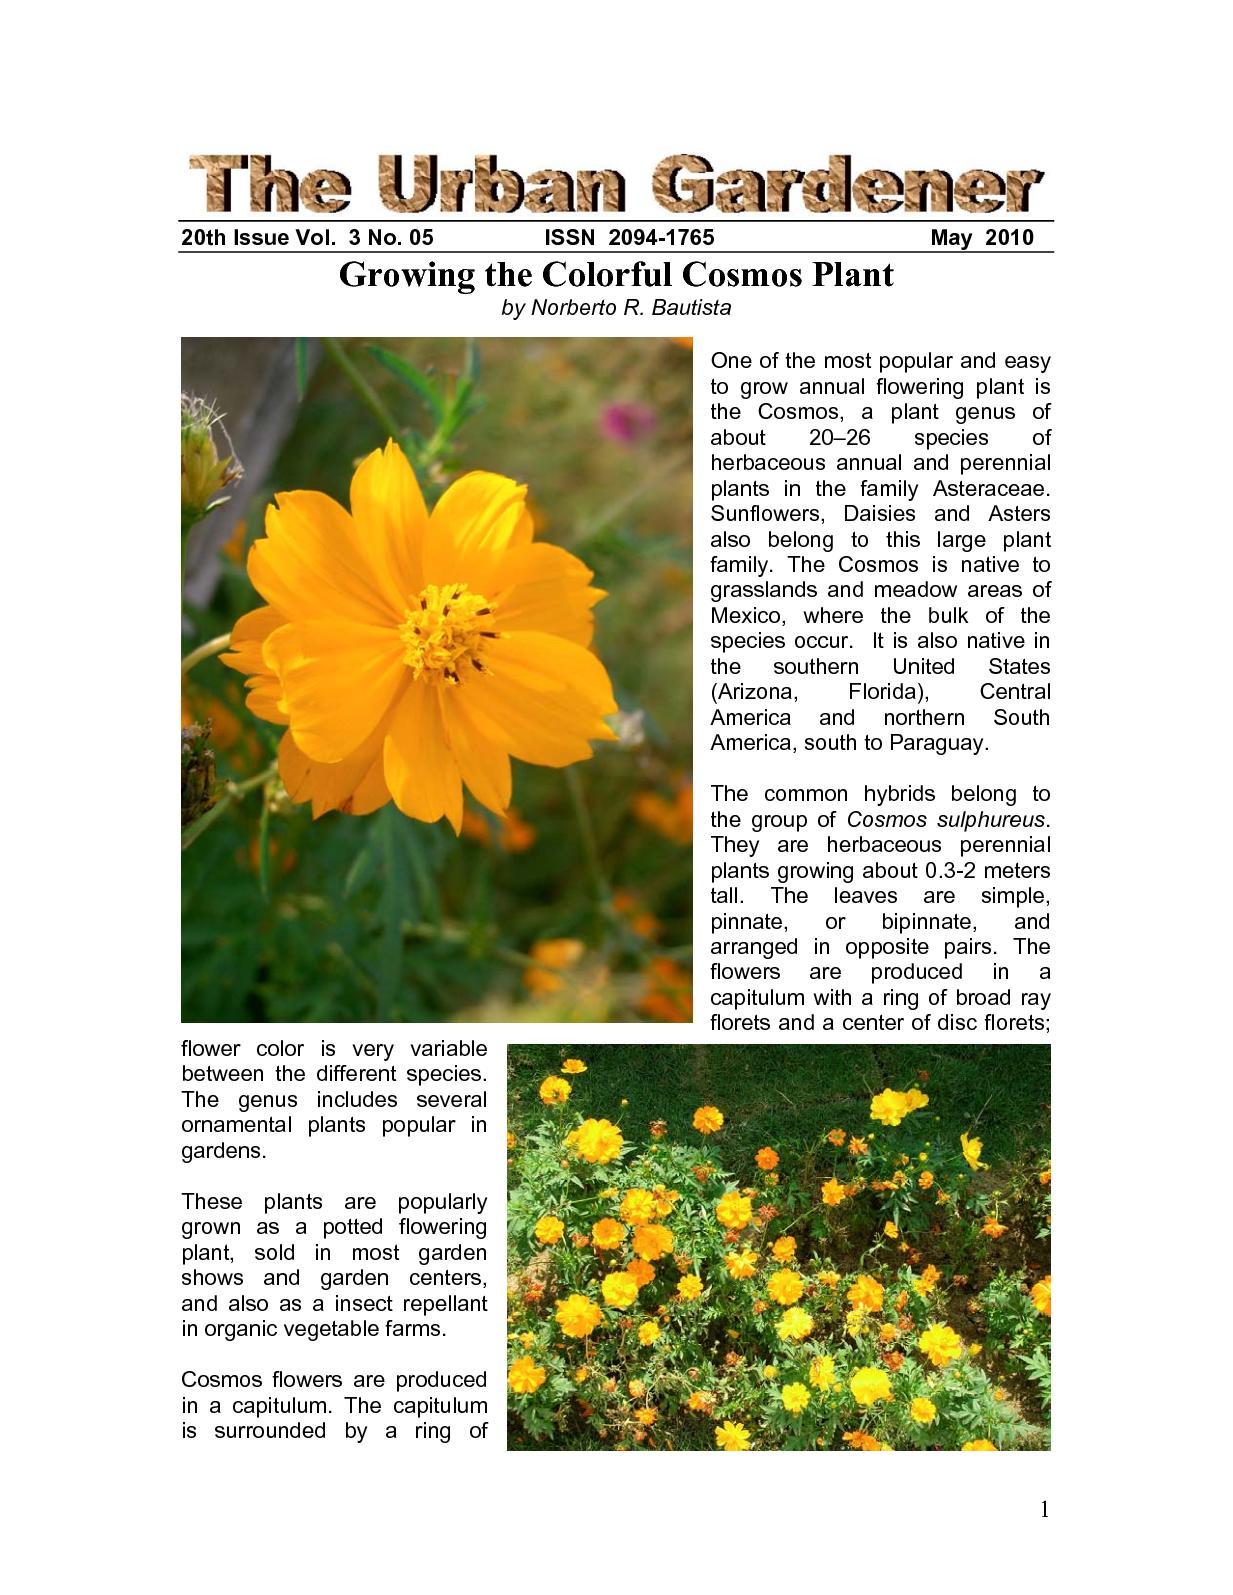 Calameo The Urban Gardener 20